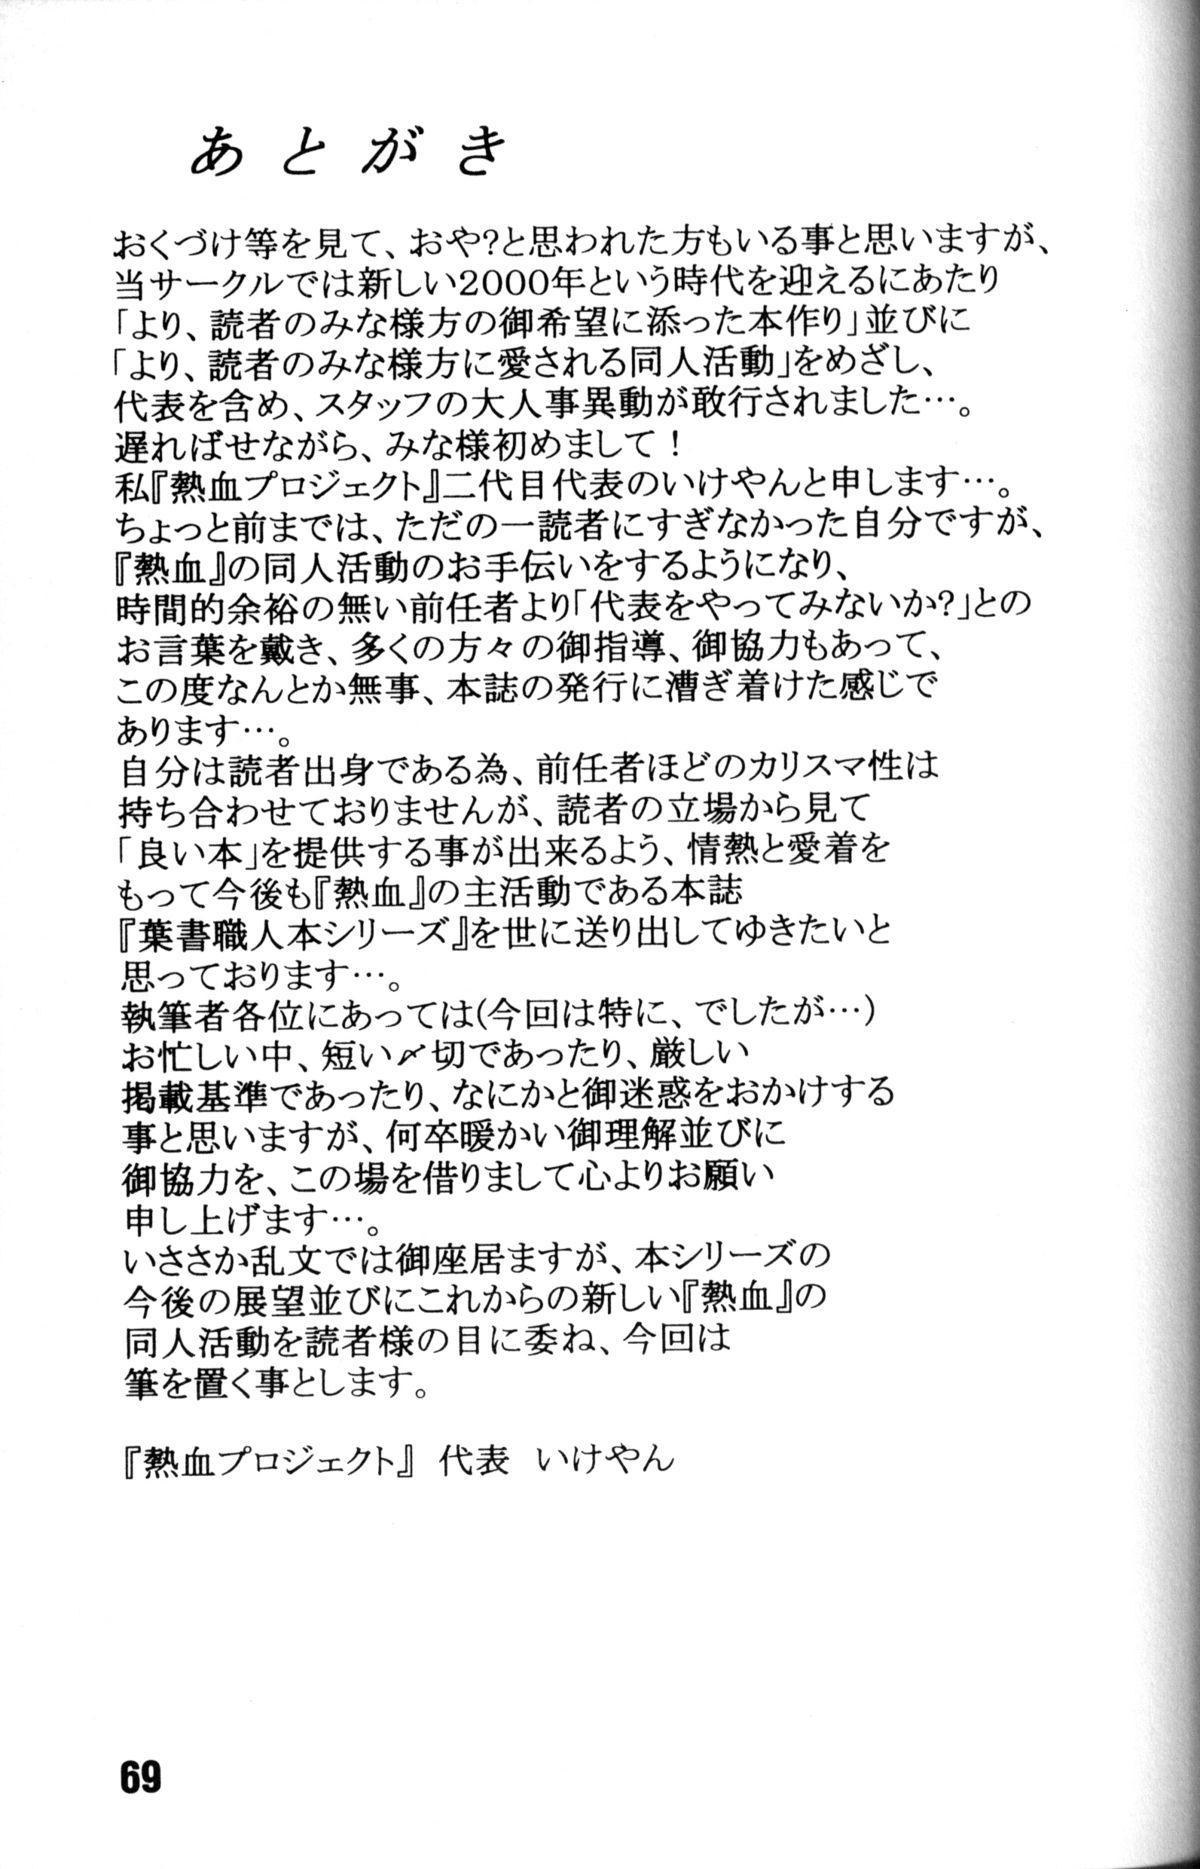 Anthology - Nekketsu Project - Volume 4 'Shounen Vanilla Essence' 67